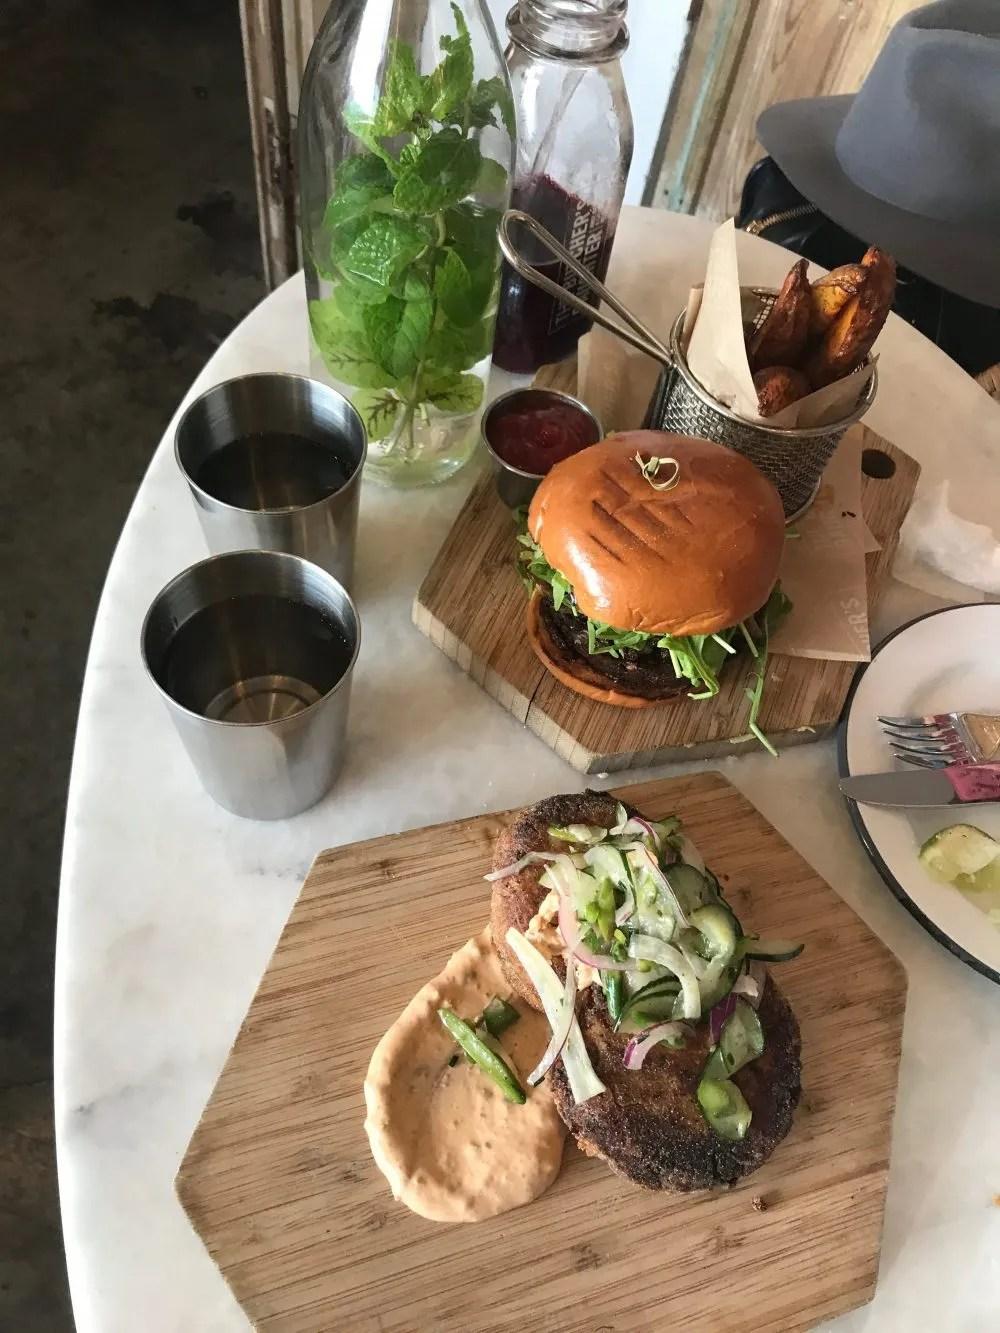 Best Bicoastal Vegan Restaurant by Liz in Los Angeles